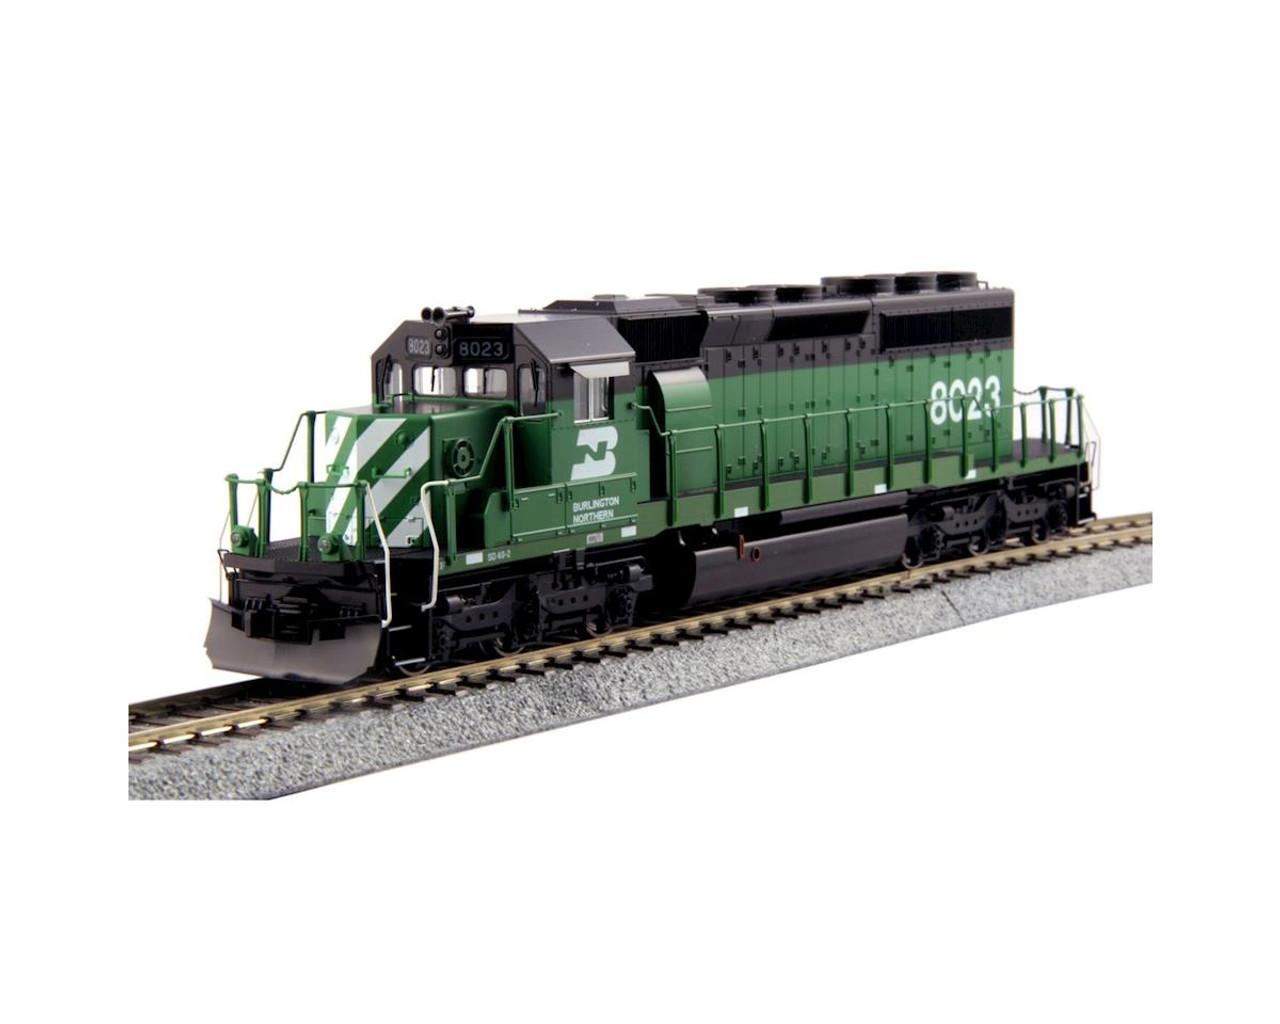 KAT376605  HO SD40-2 Diesel BN #8023